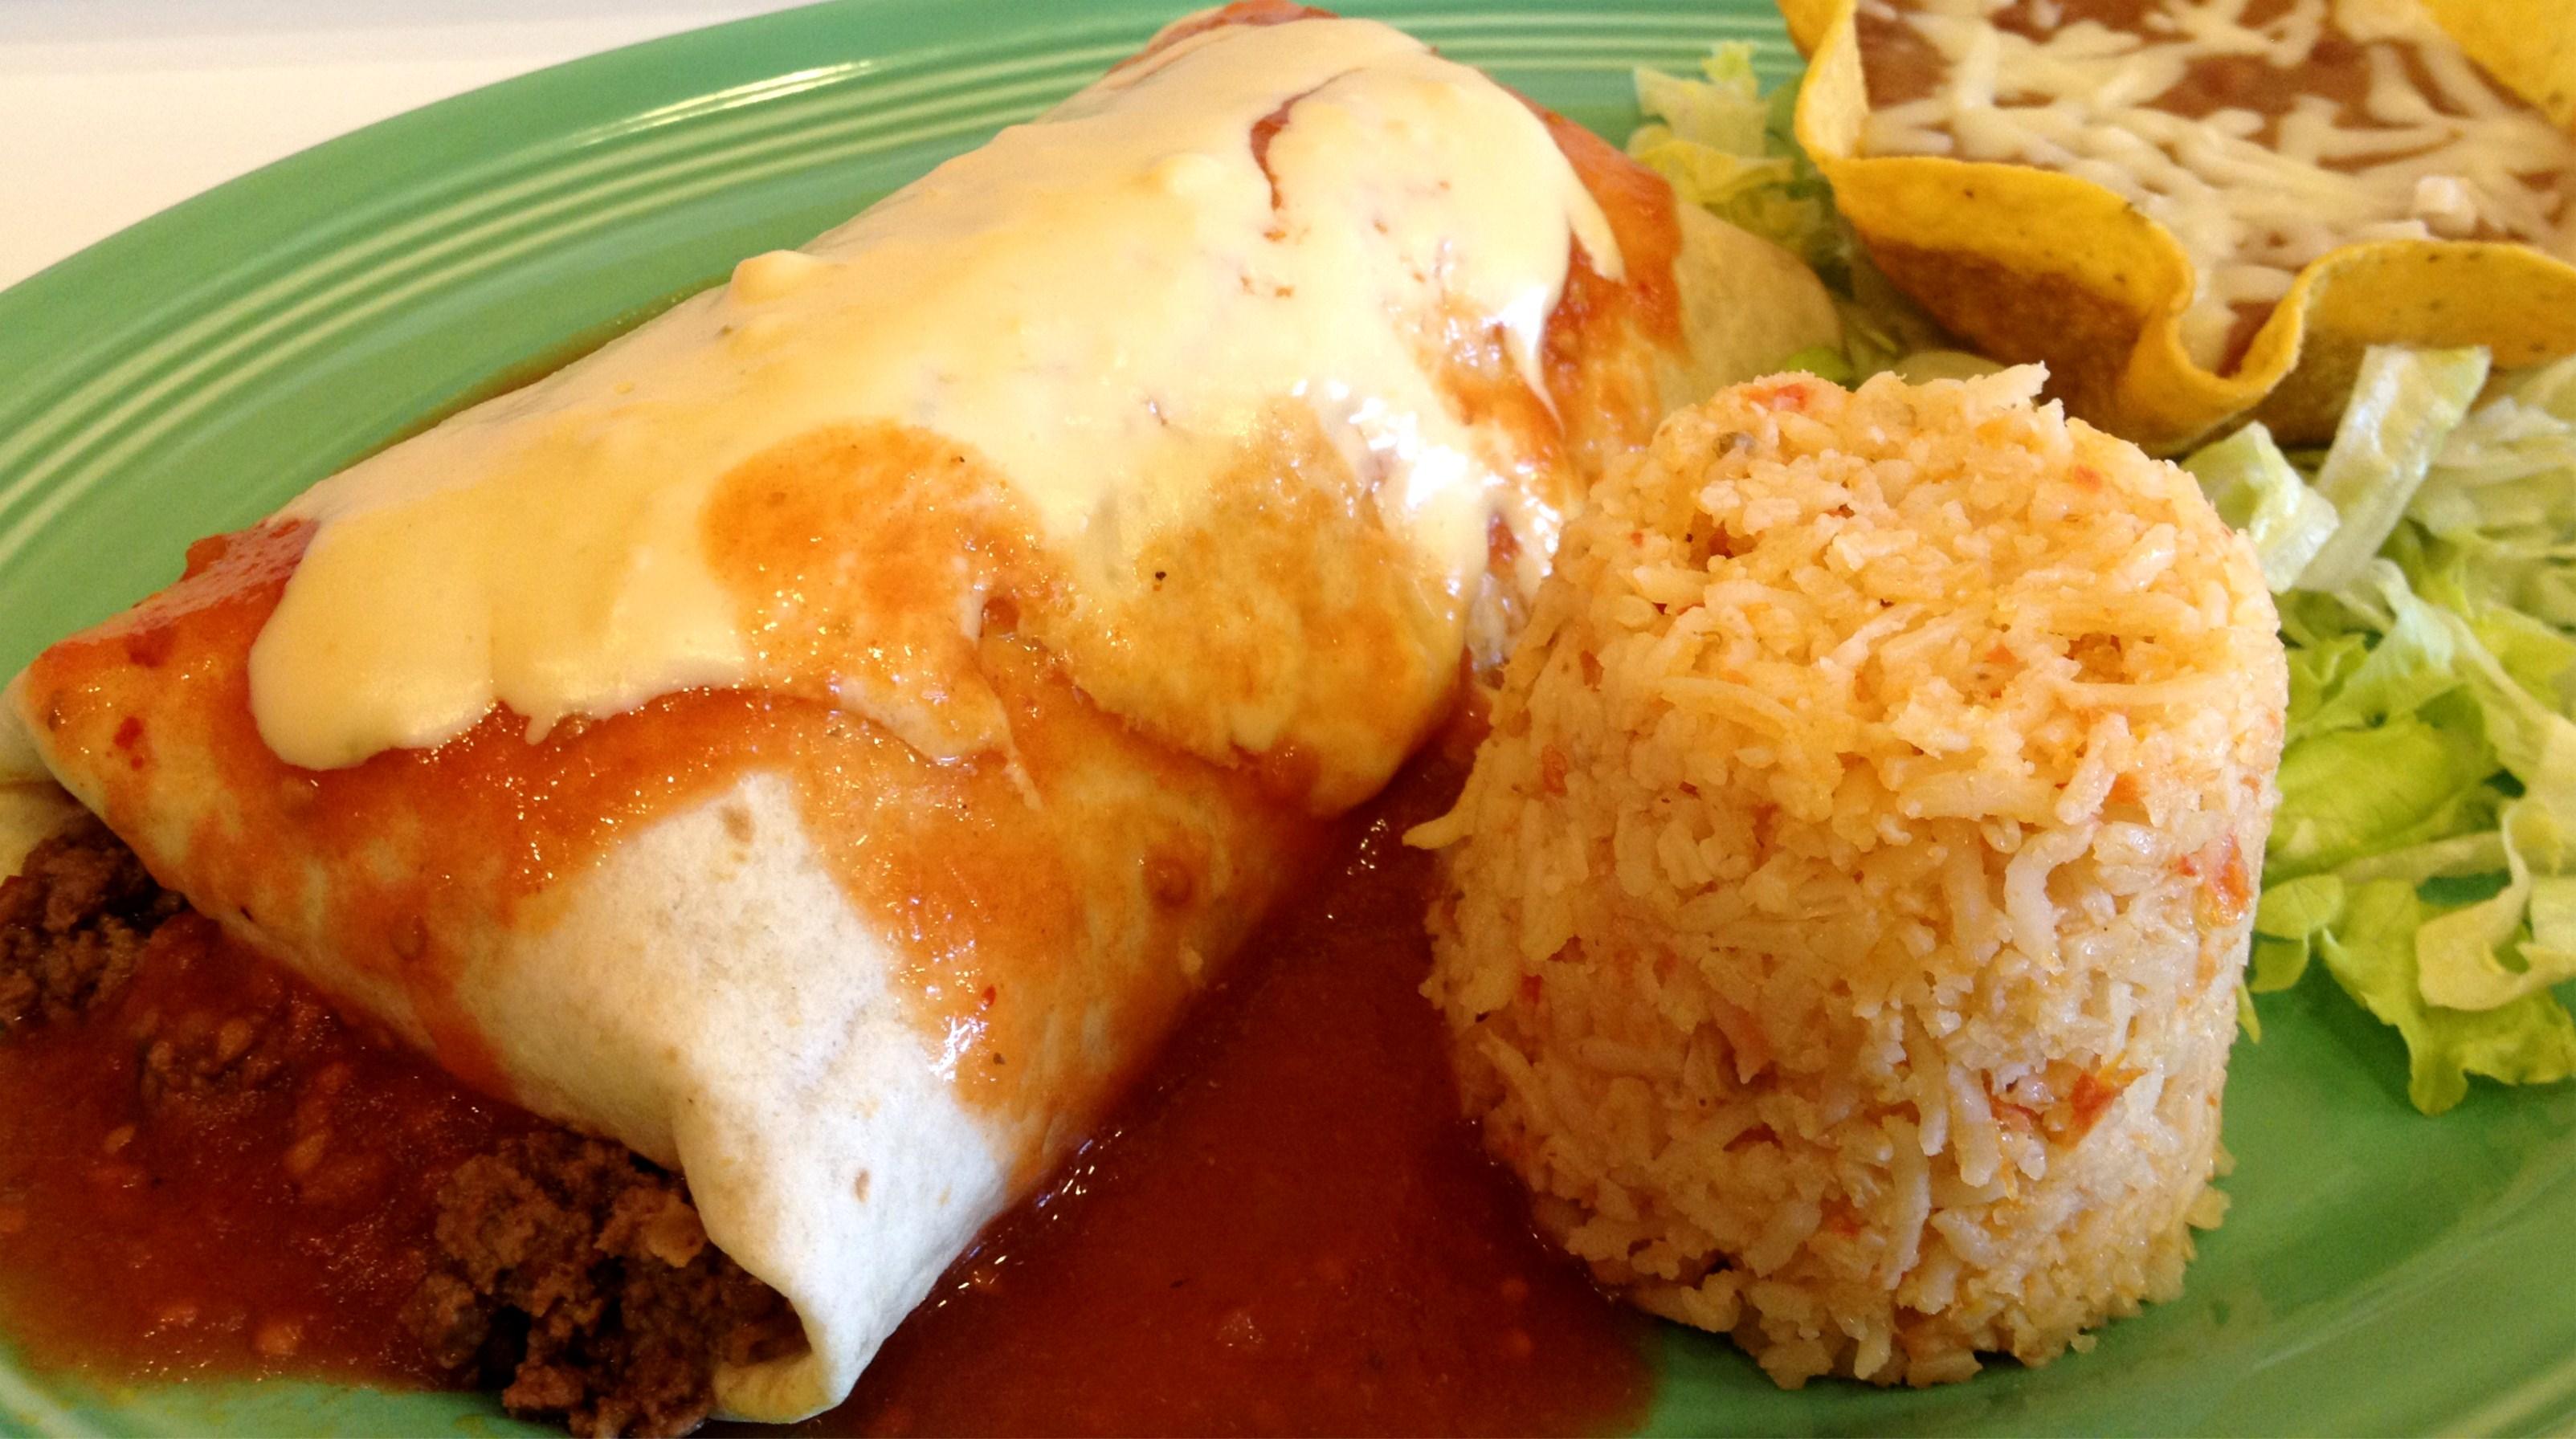 Traditional Burrito Image